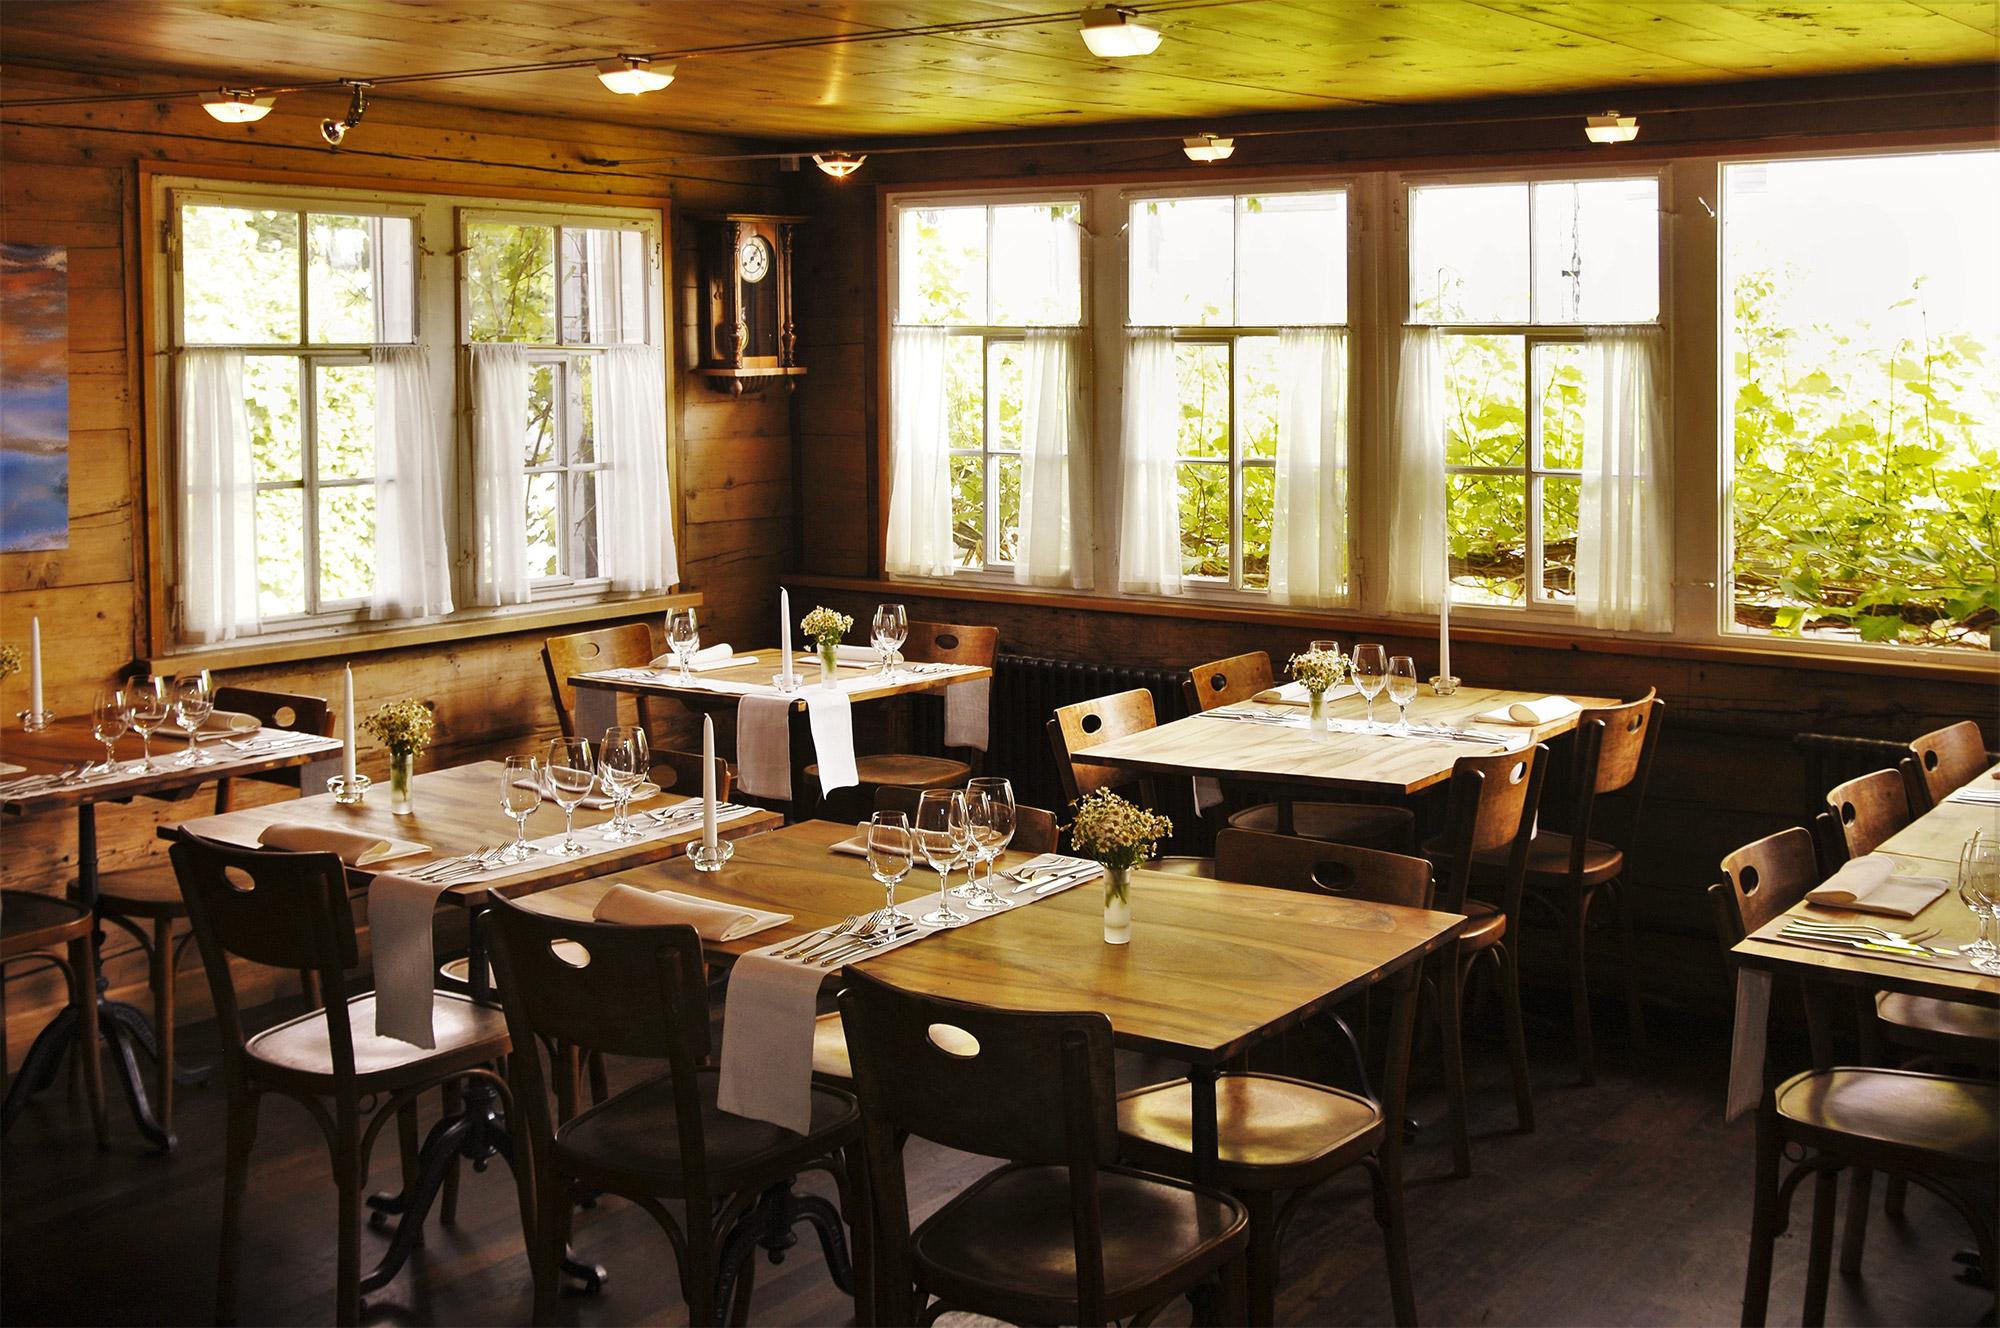 Fresh, organic gourmet cuisine is served in the Säli